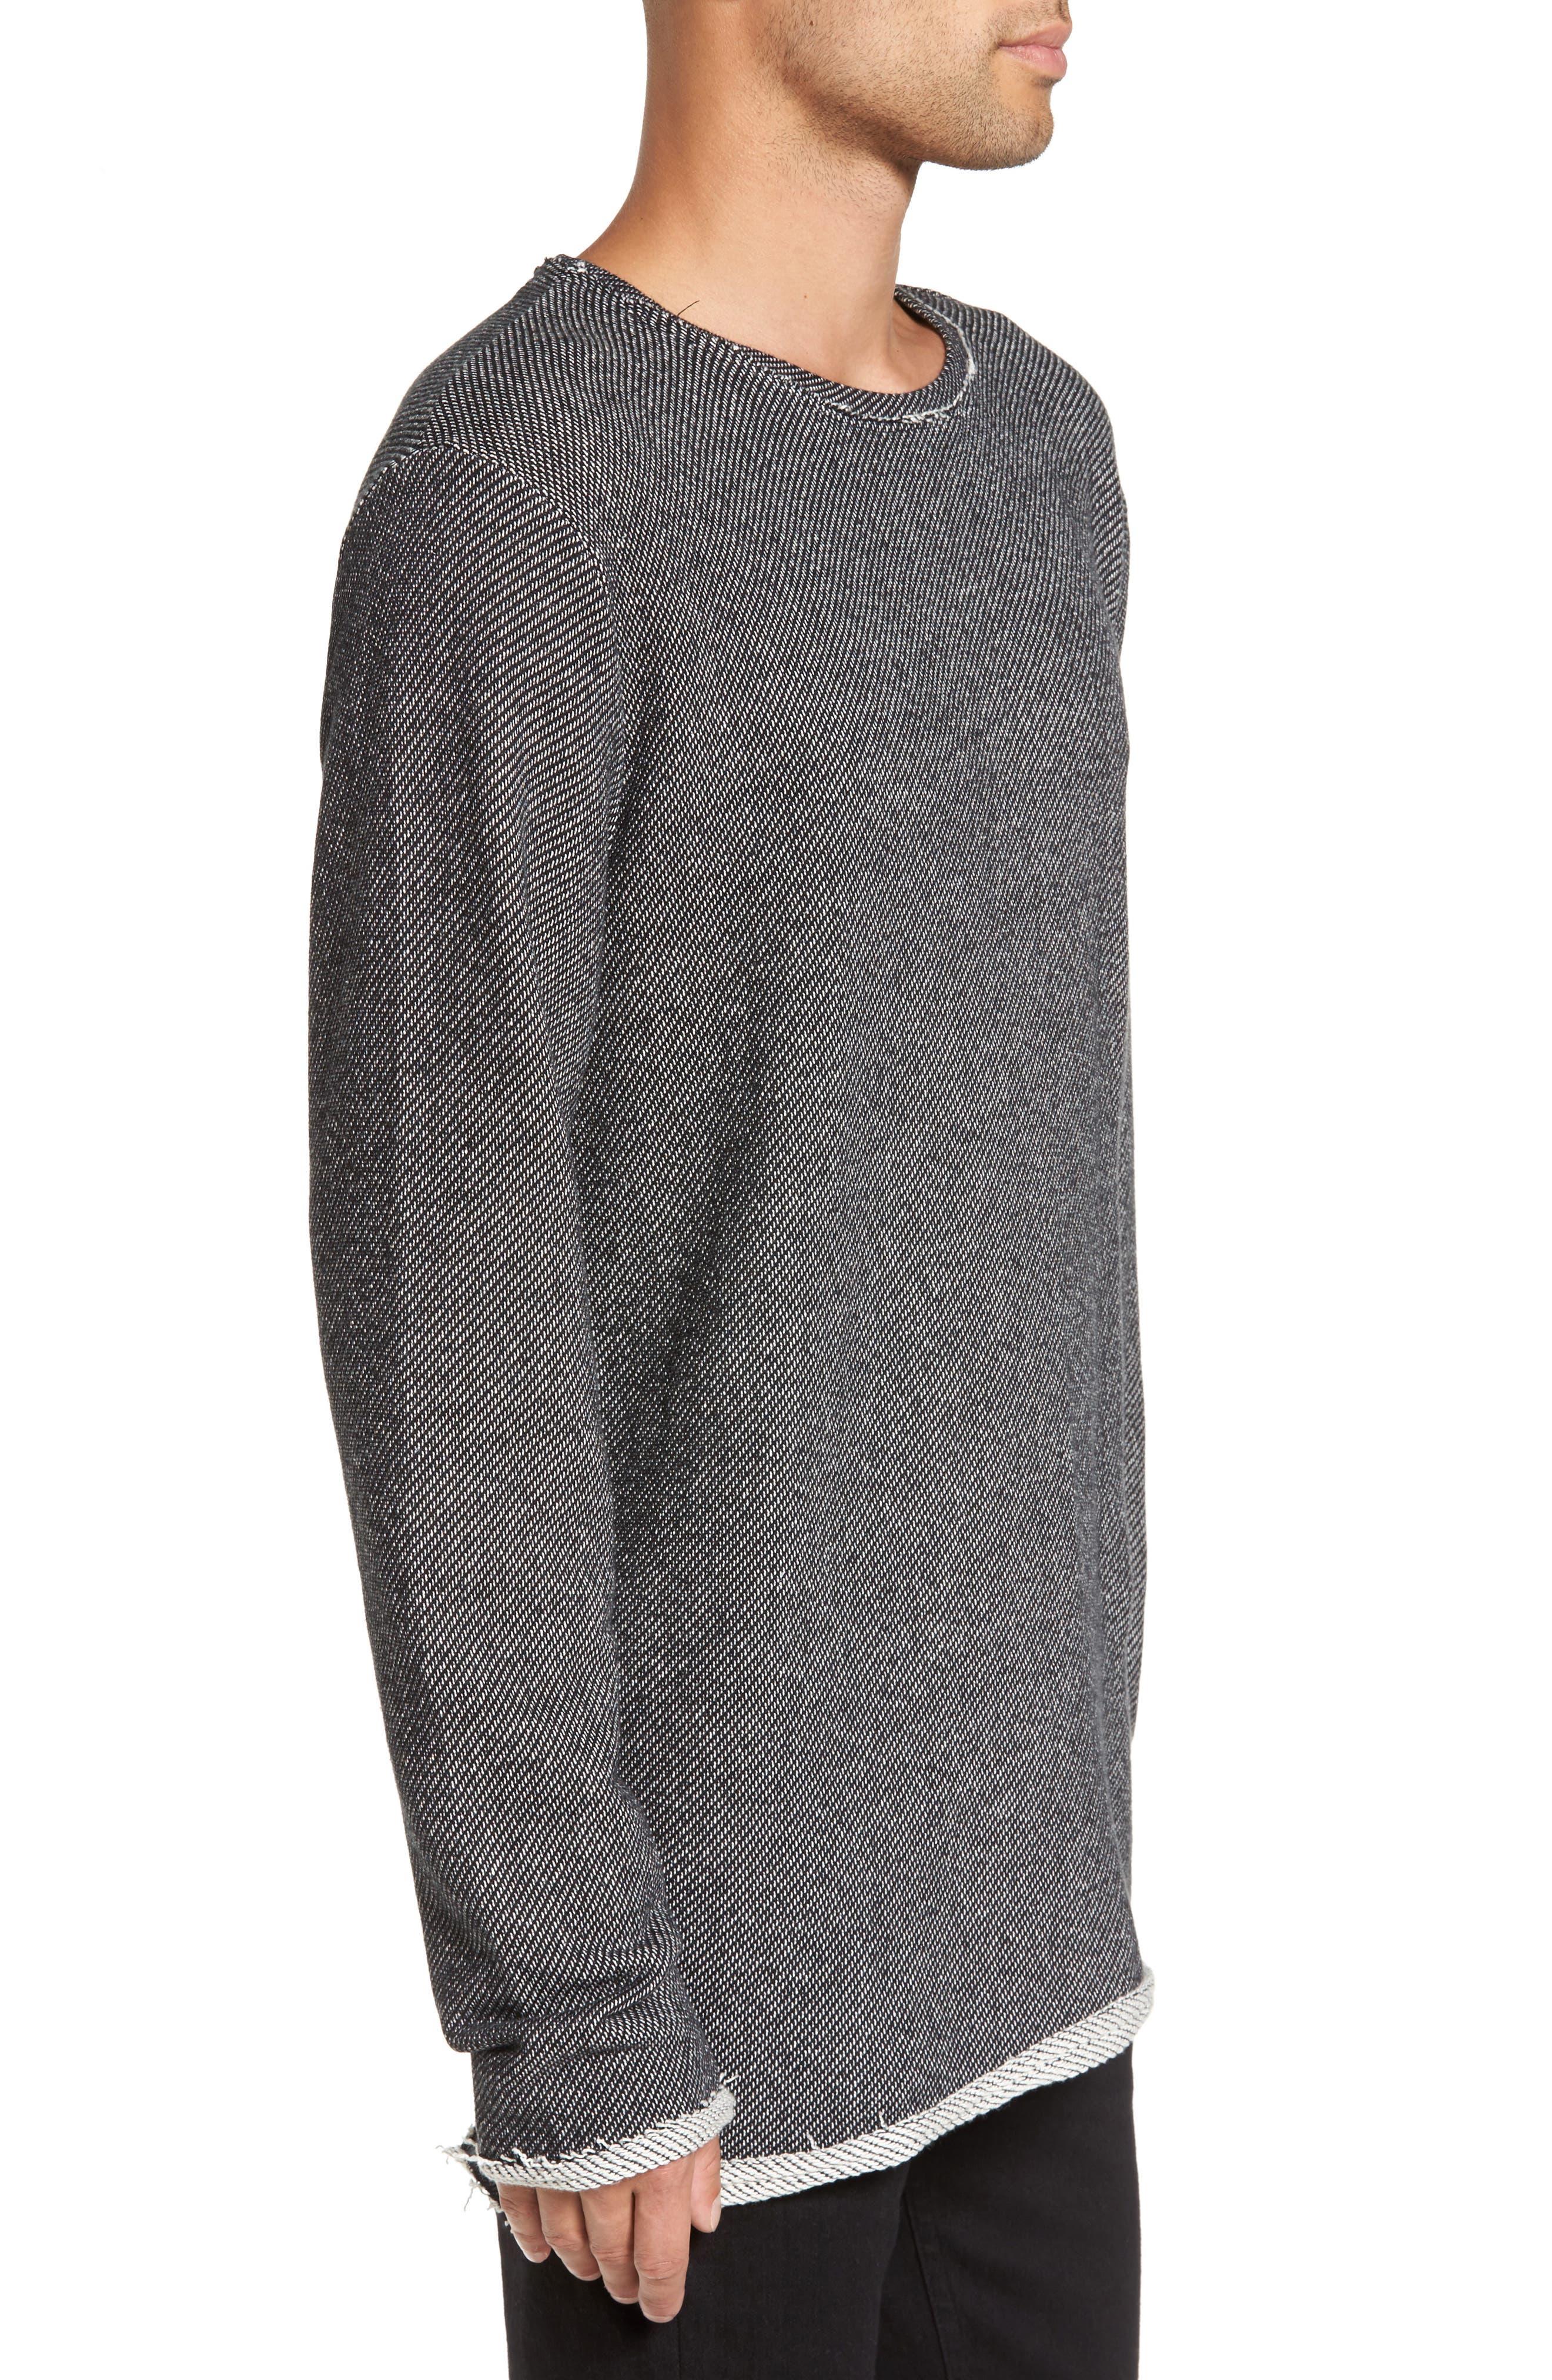 Ralf Sweater,                             Alternate thumbnail 3, color,                             001